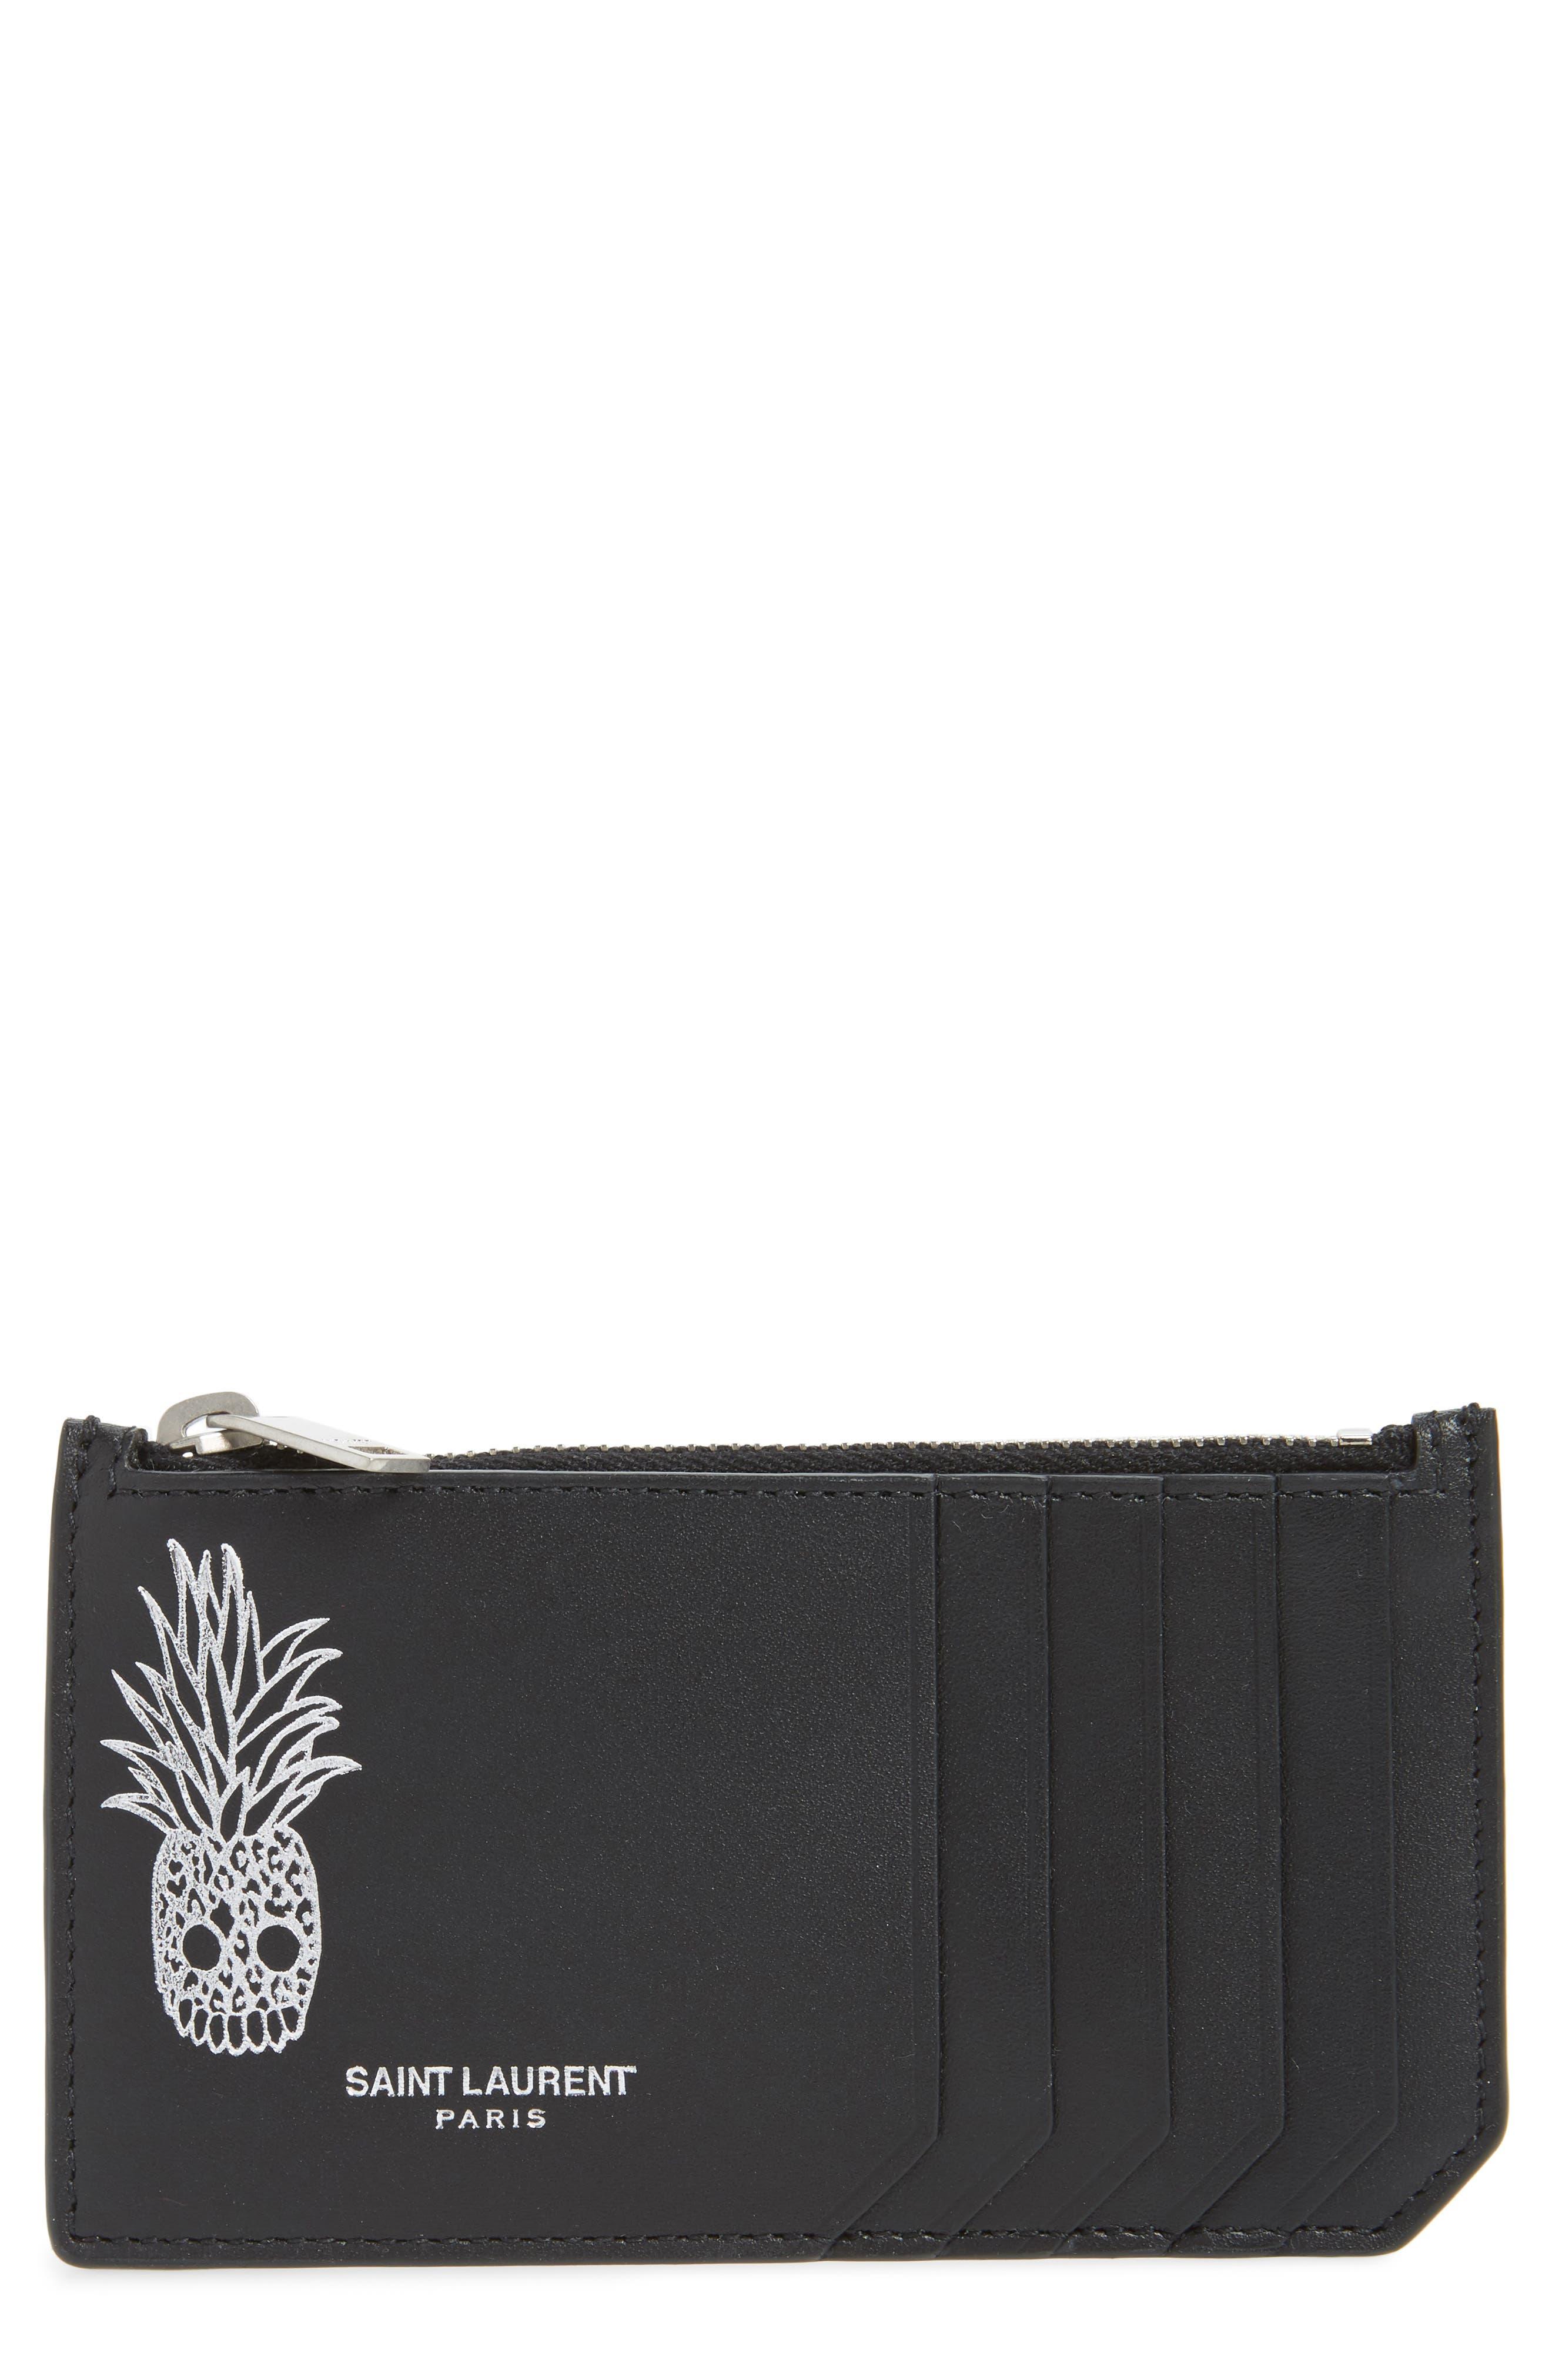 Pineapple Skull Leather Zip Card Case, Main, color, BLACK